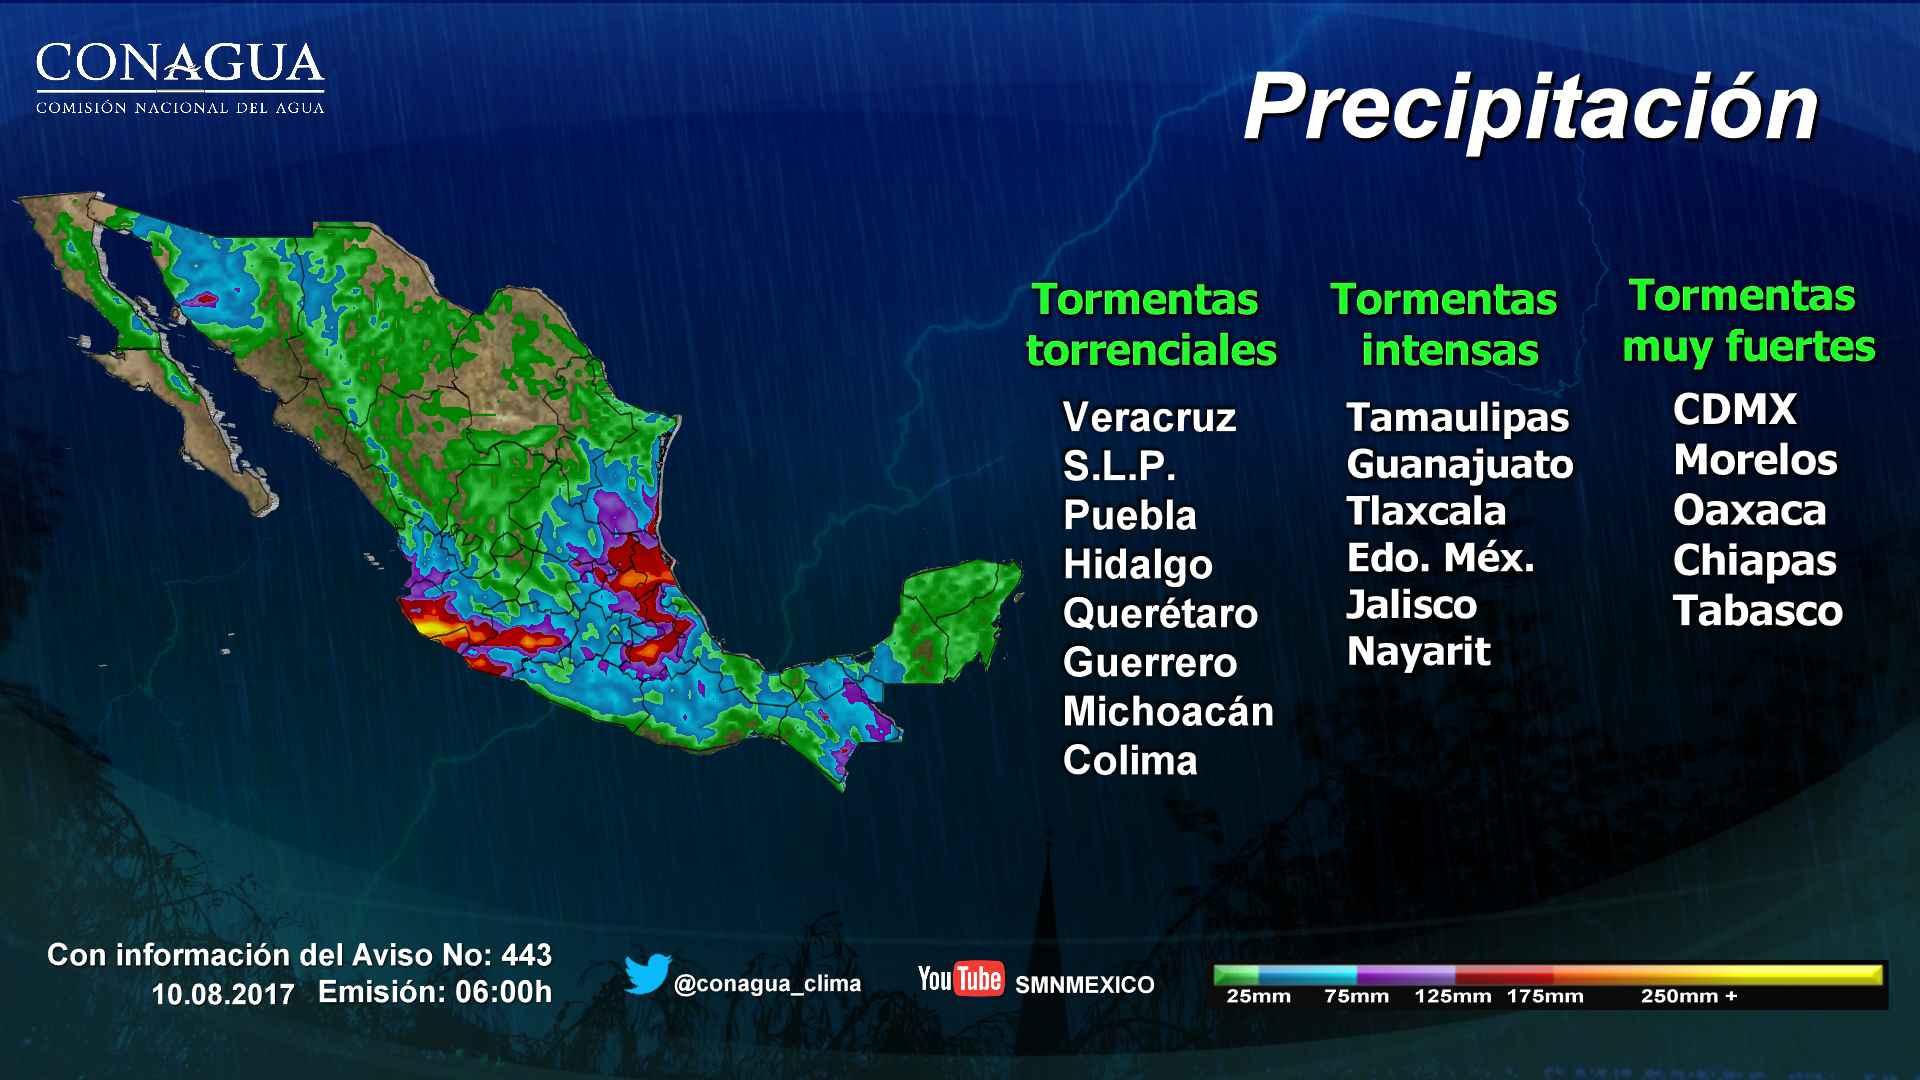 Se pronostican lluvias de muy fuertes a intensas para Tlaxcala